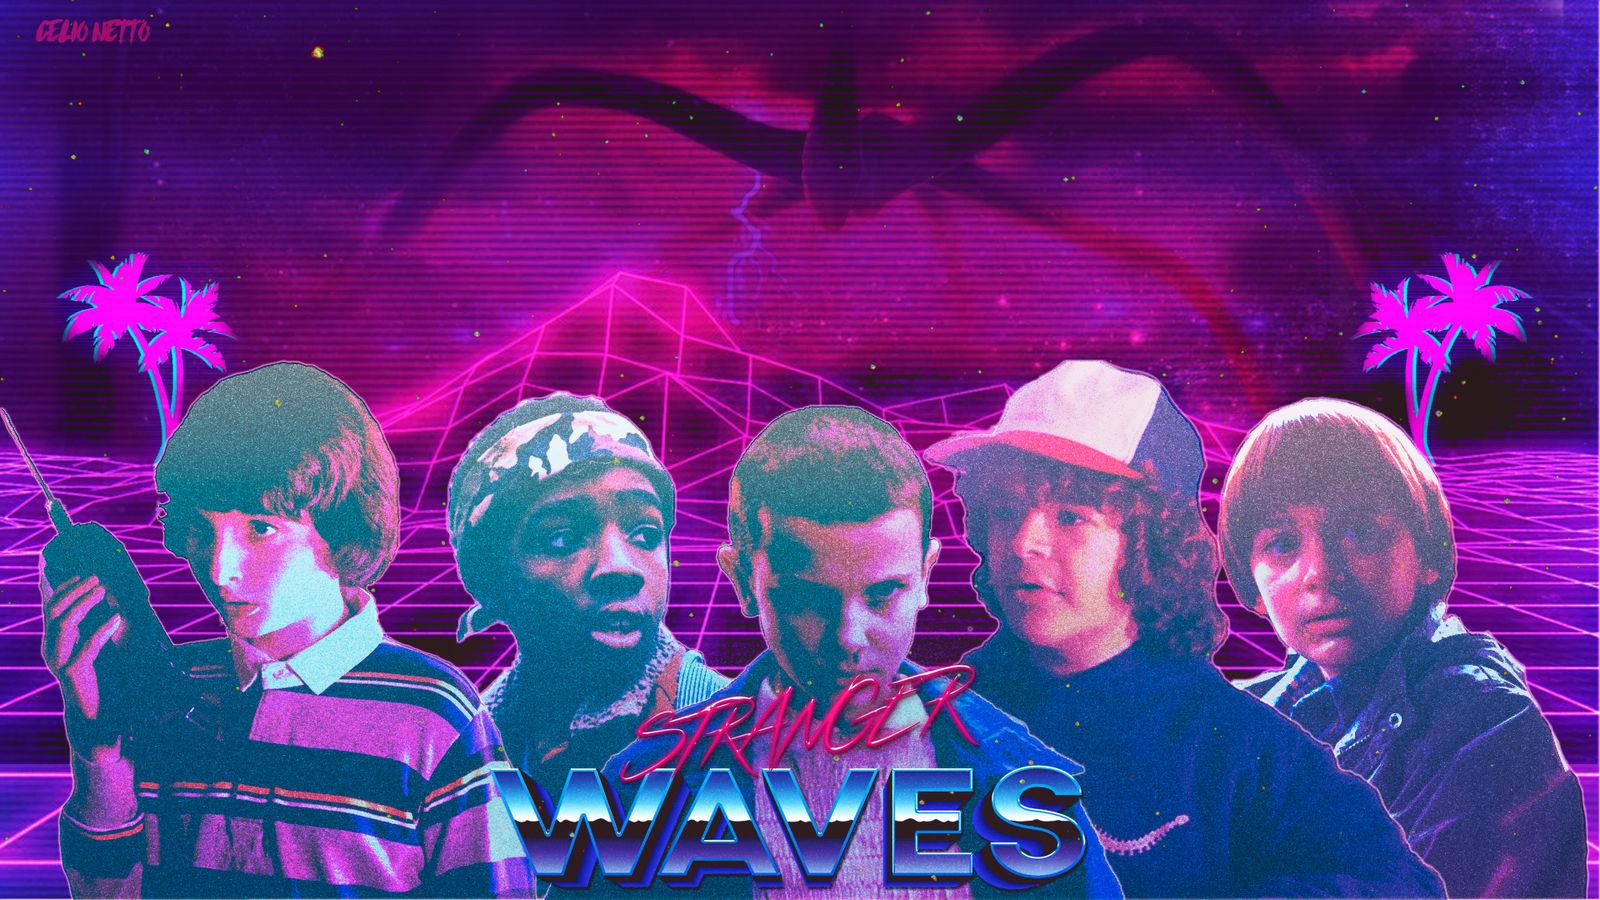 Stranger Waves - 80's Retro Wave Wallpaper Style by nktetas